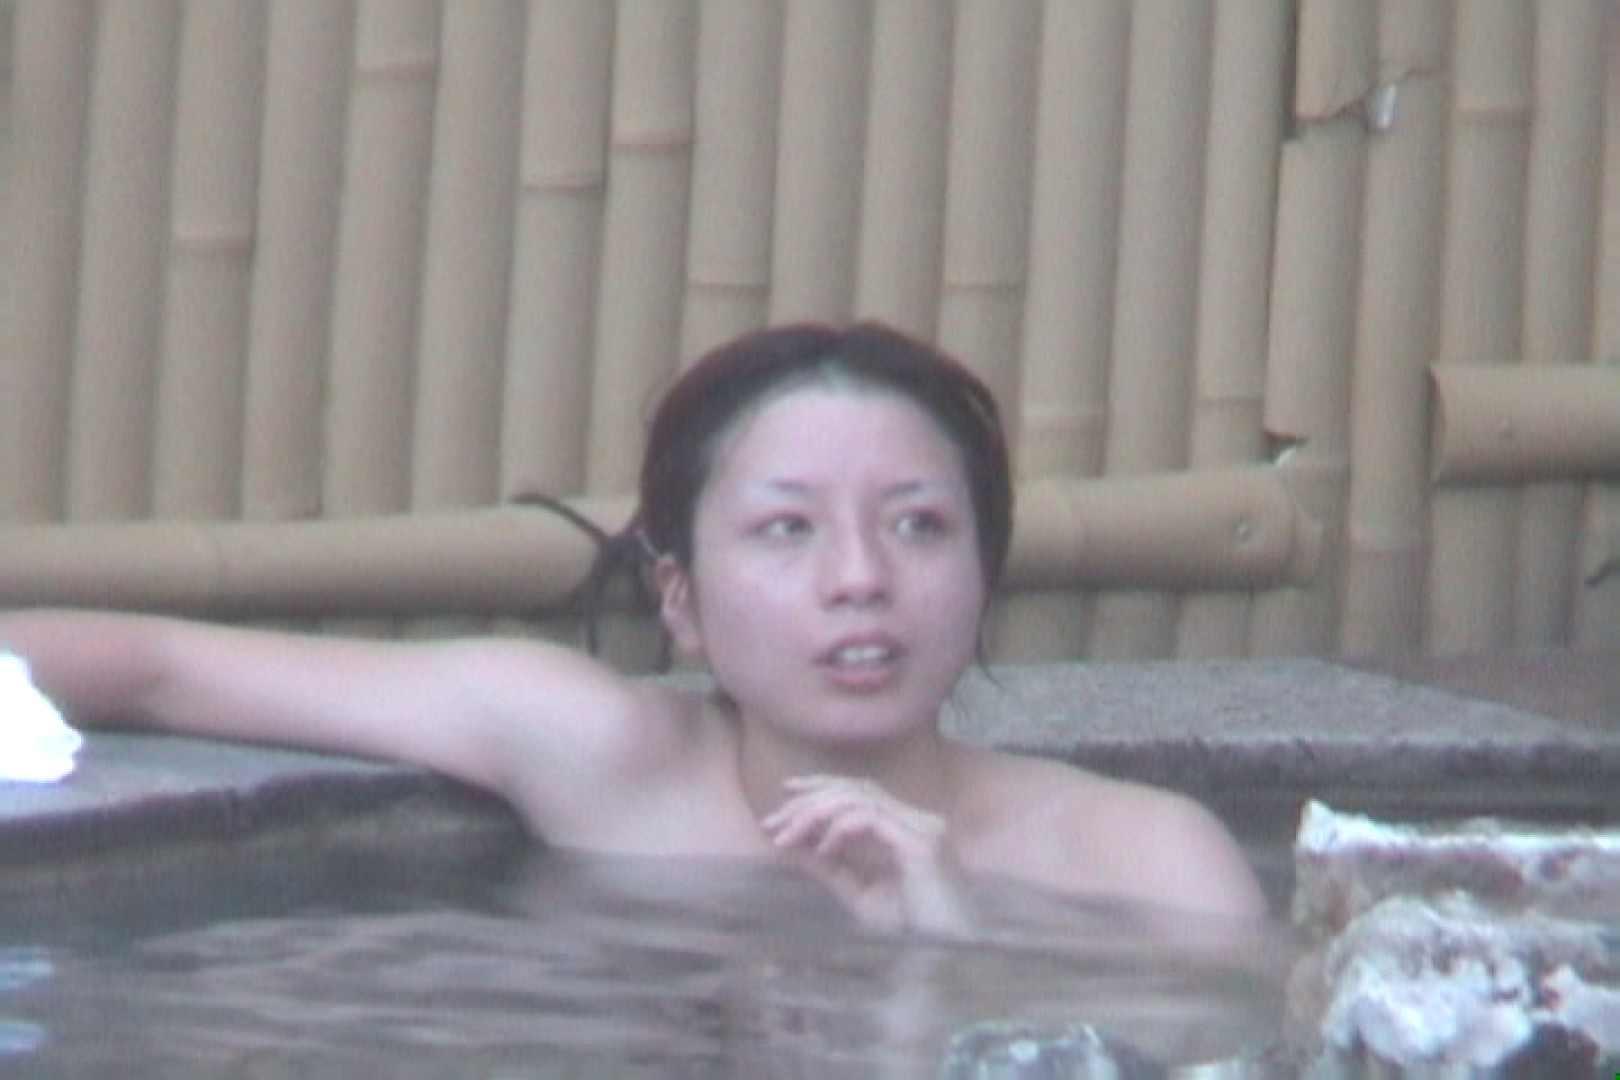 Aquaな露天風呂Vol.608 露天風呂突入 | 盗撮師作品  95pic 73